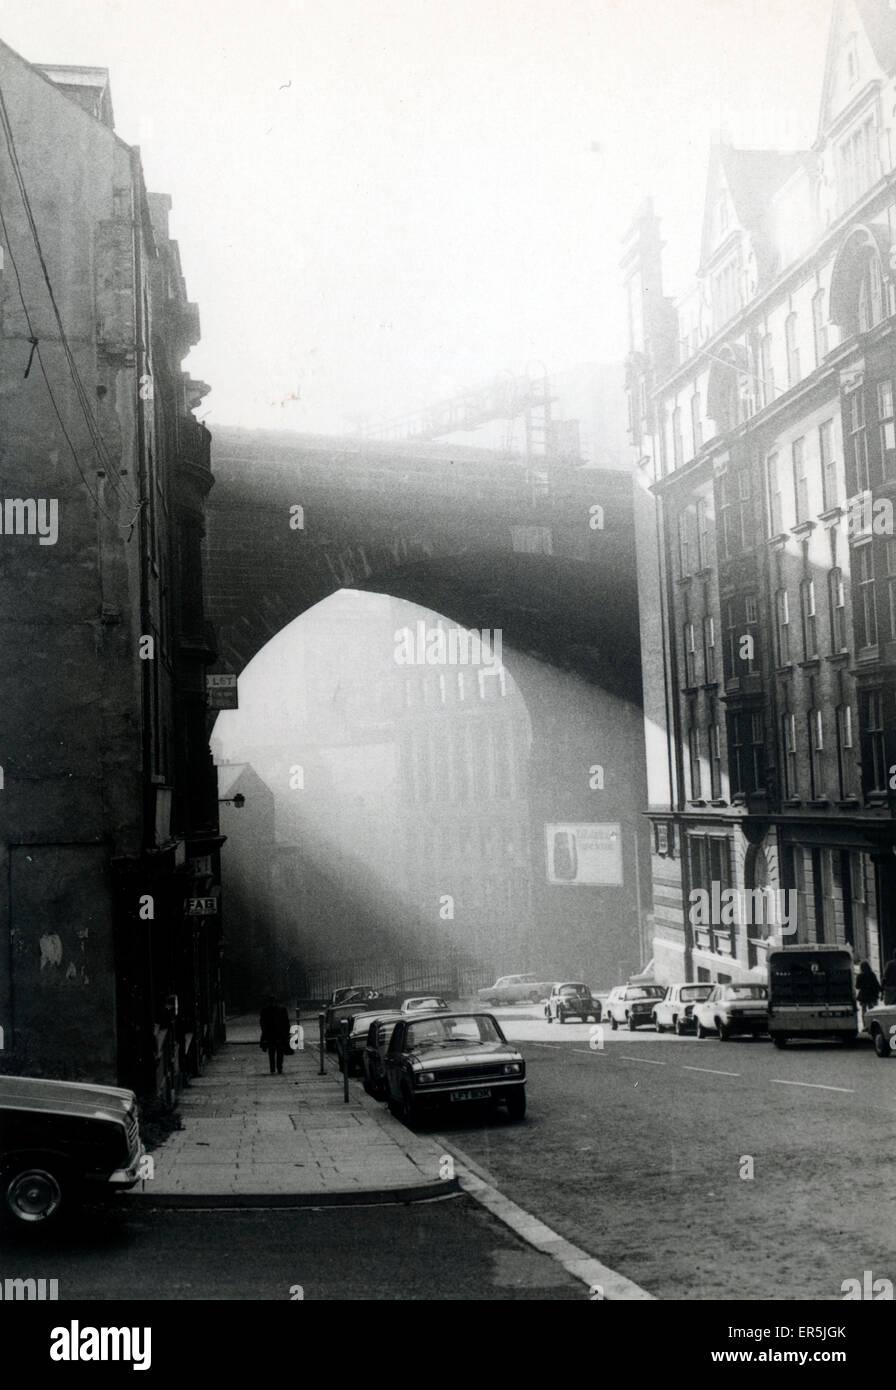 Dean Street, Newcastle-Upon-Tyne, Northumberland, England.  1960s - Stock Image